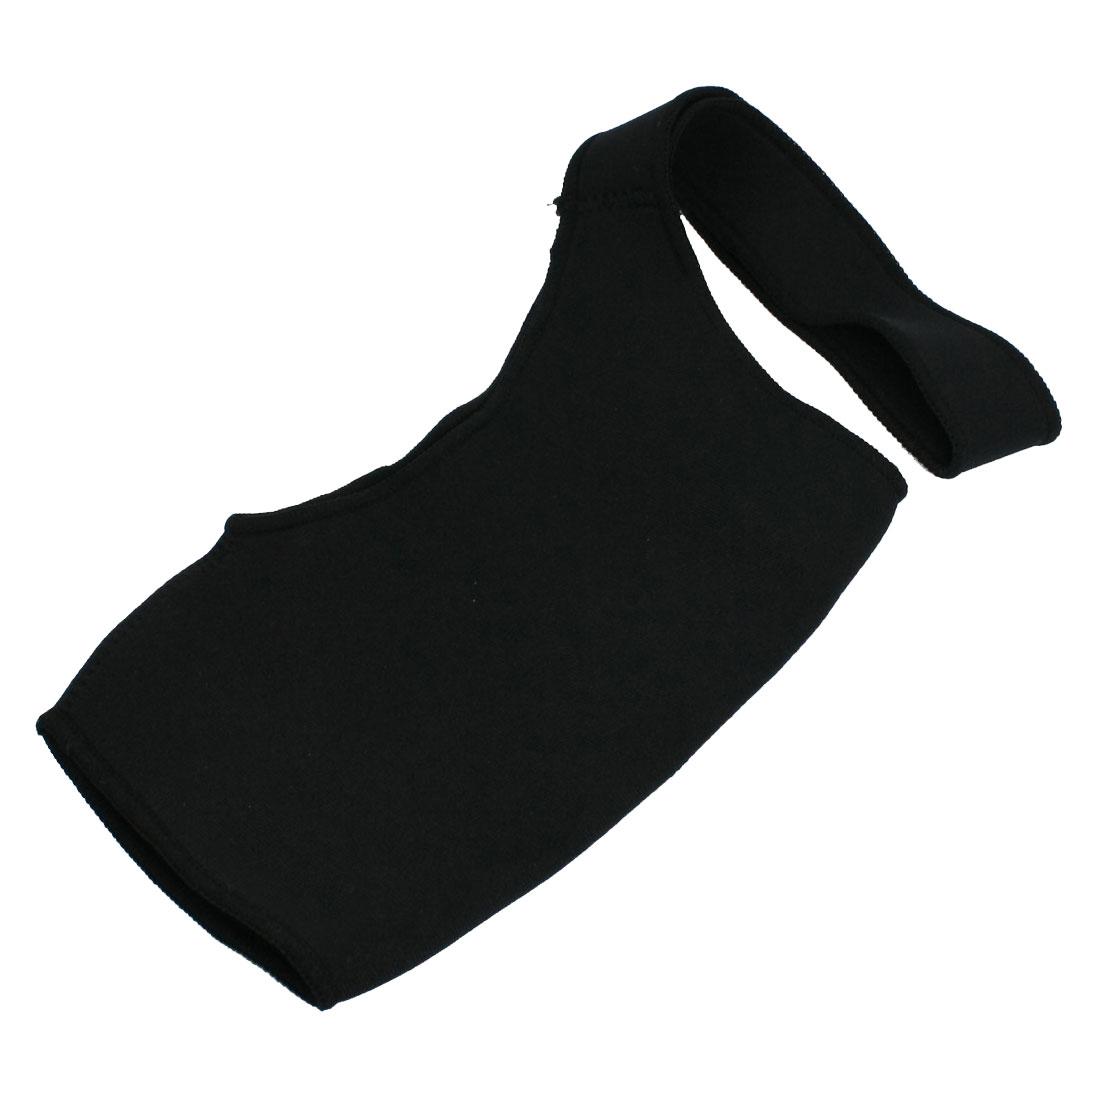 Black Soft Neoprene Elastic Sports Brace Shoulder Support for Men